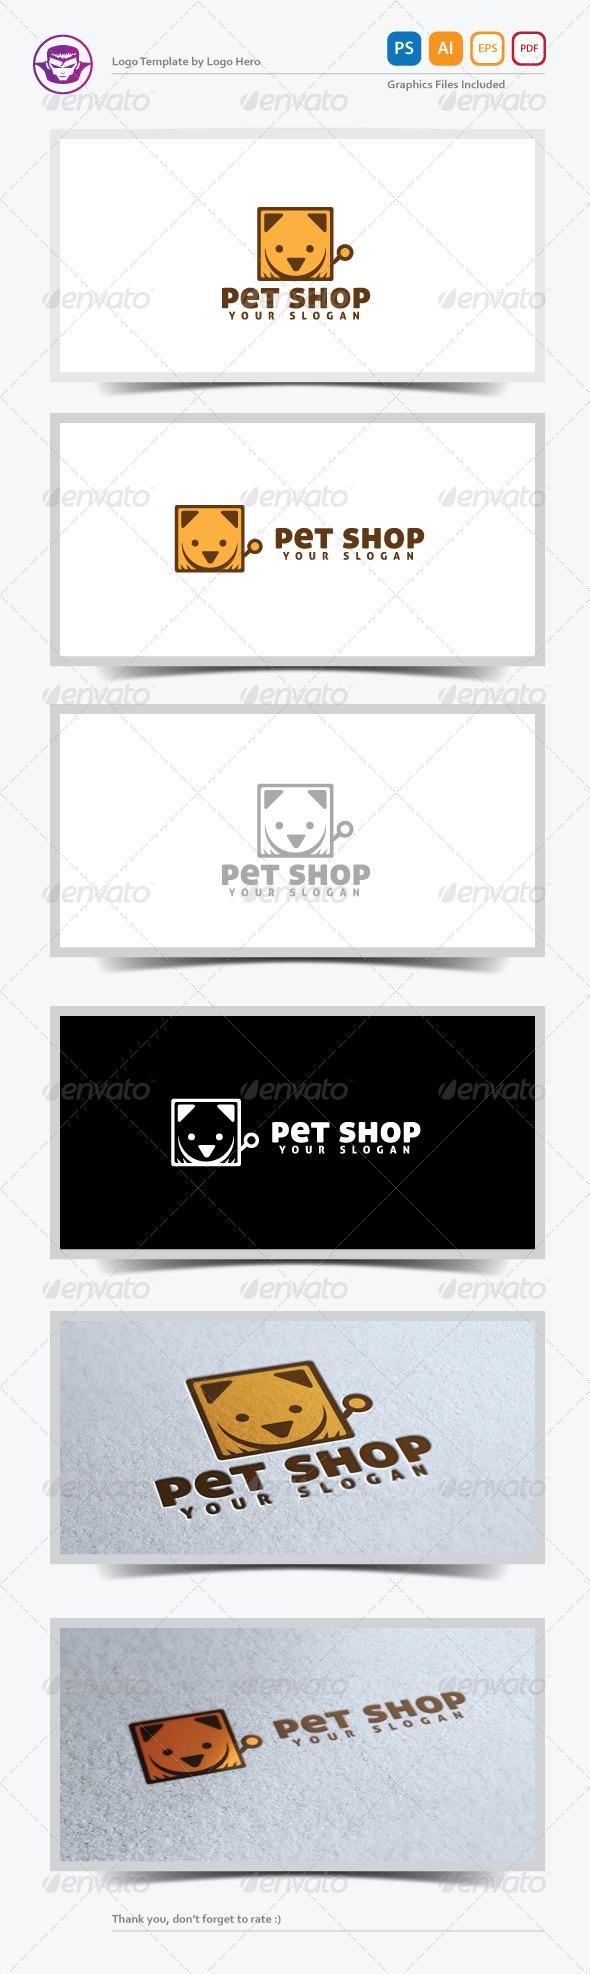 GraphicRiver Pet Shop Logo Template 5220921